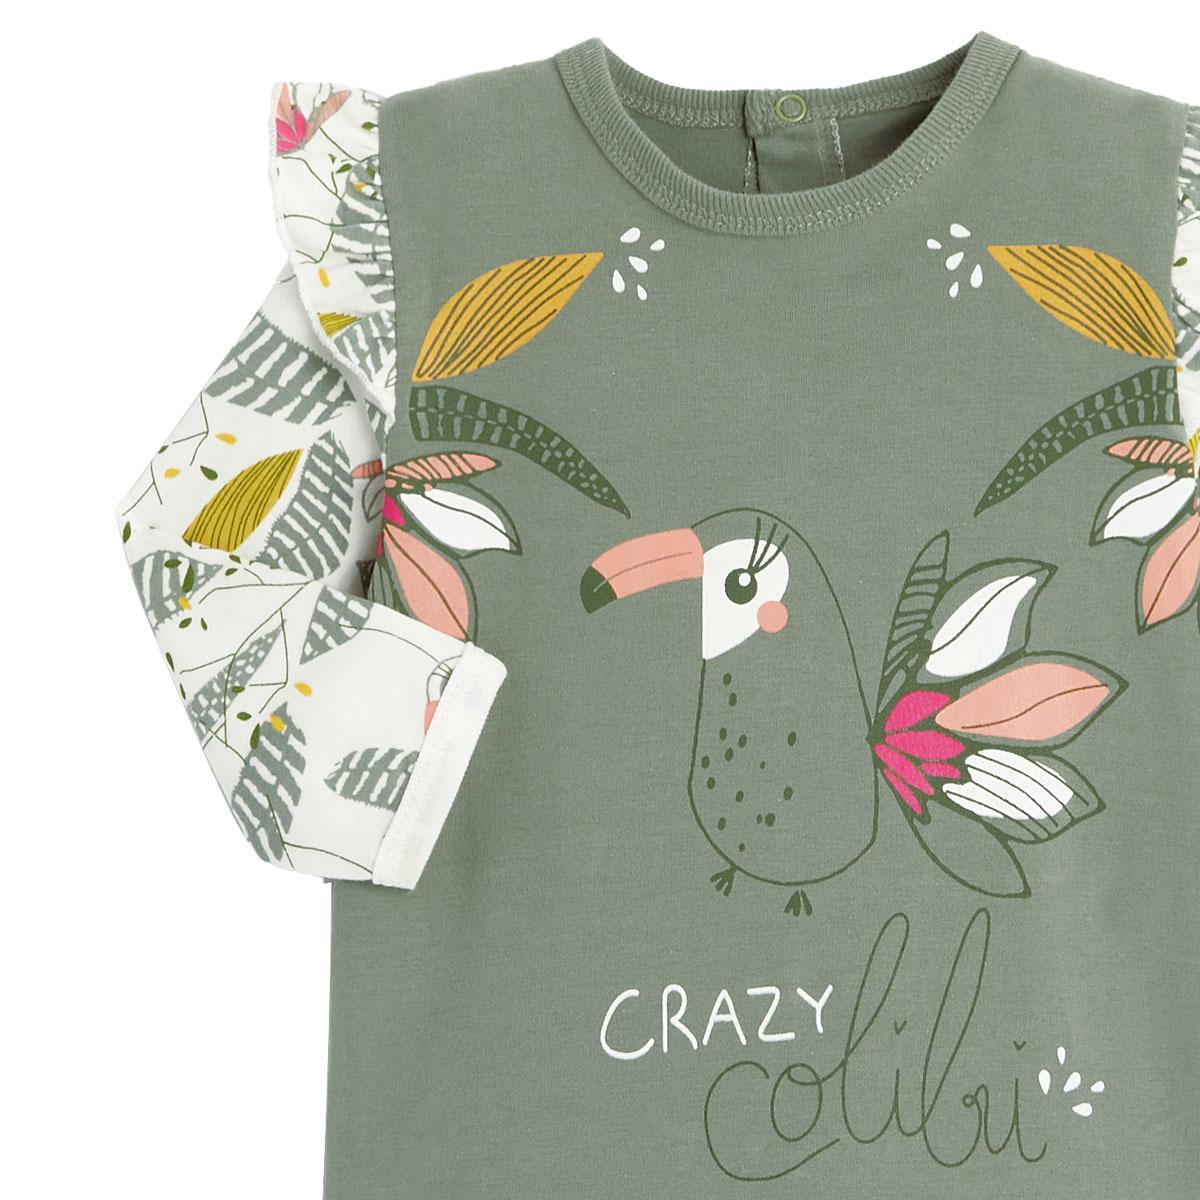 Pyjama bébé contenant du coton bio Crazy Colibri zoom